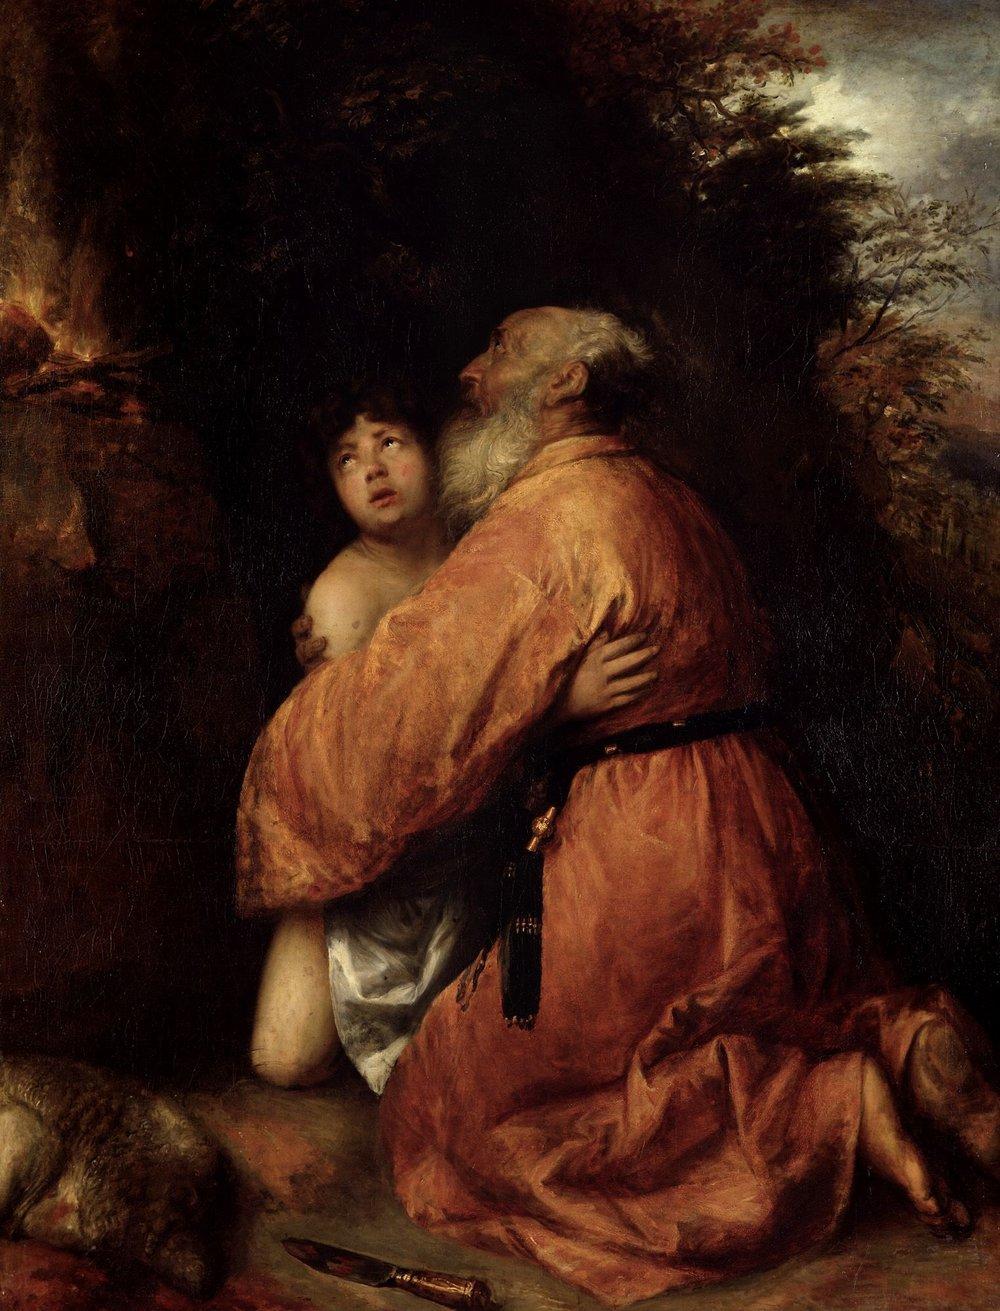 Jan_Lievens_-_The_Sacrifice_of_Isaac_(c.1638).jpg